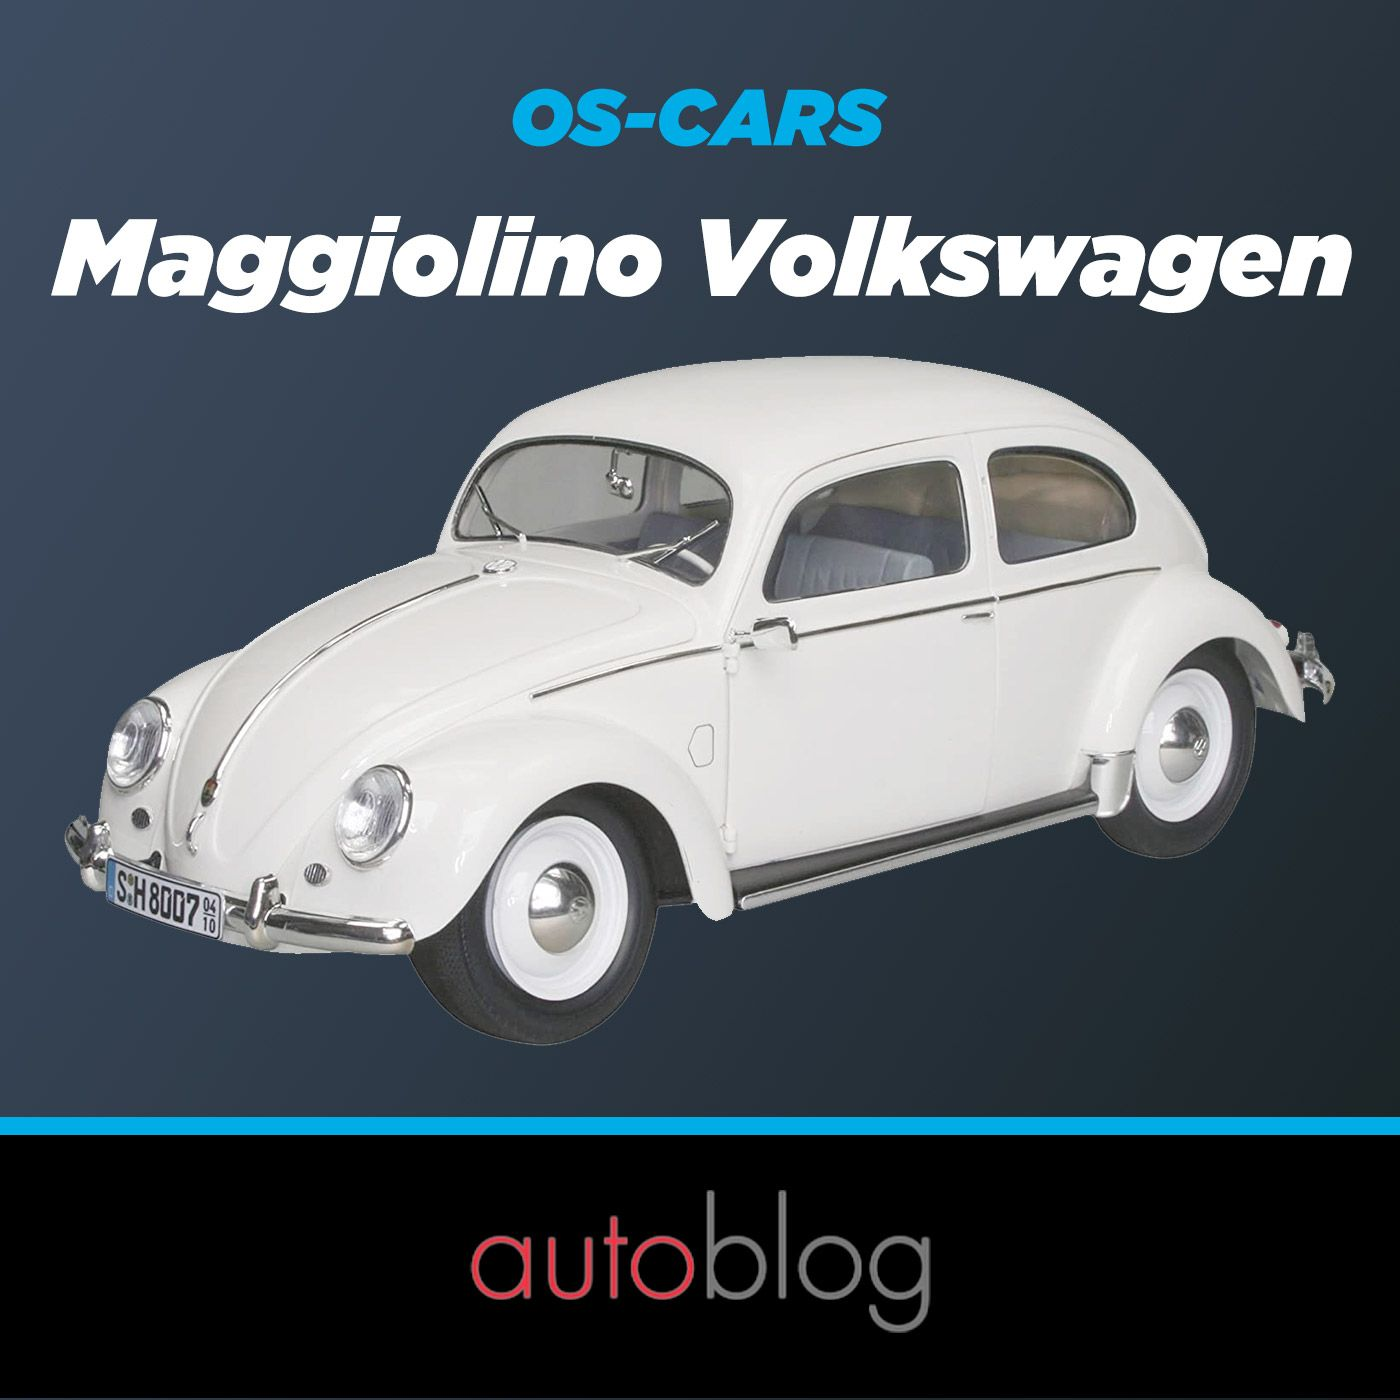 Ep.2 Maggiolino Volkswagen